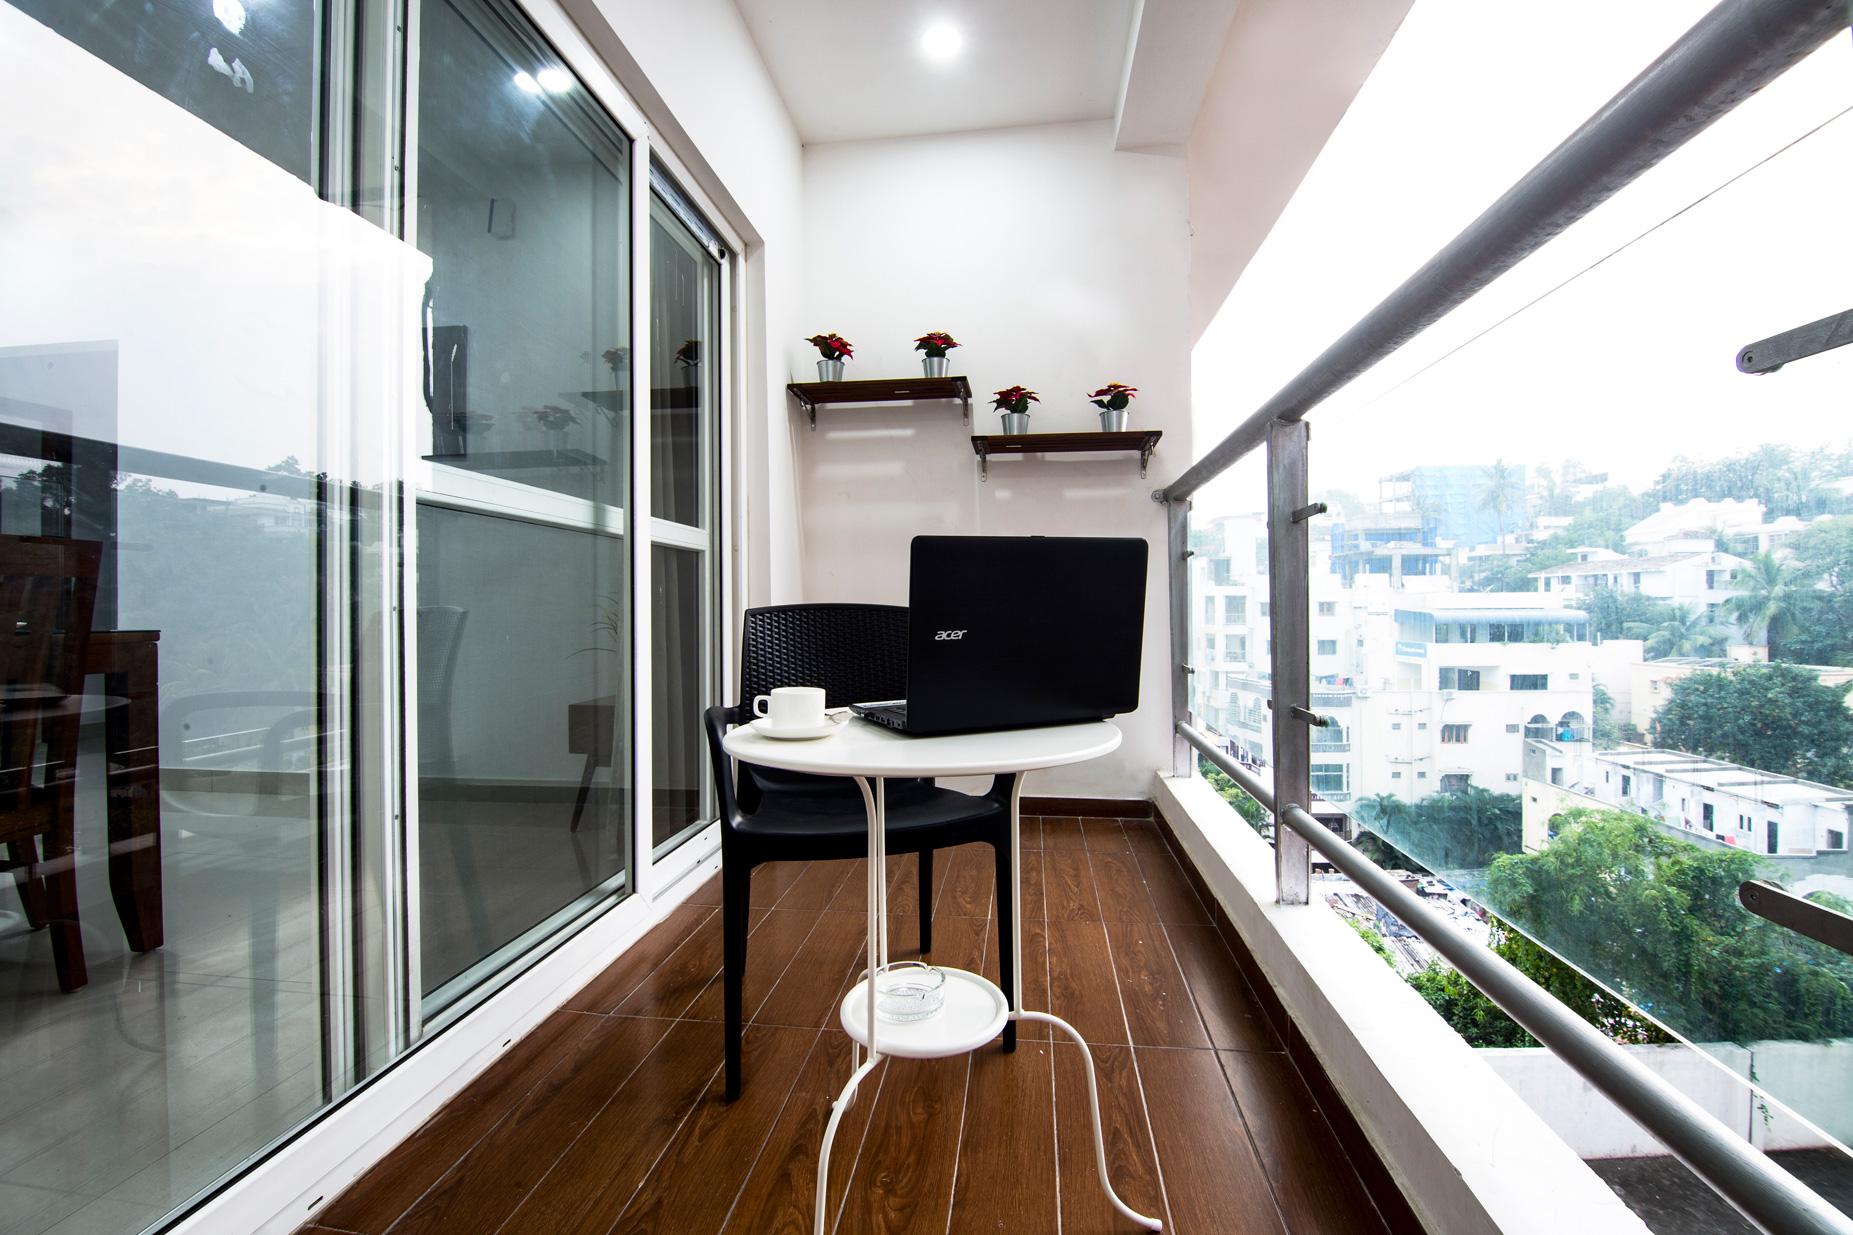 skyla-service-apartment-hyderabad-banjara-hills-bluefox-restaurant-3bhk8.jpg